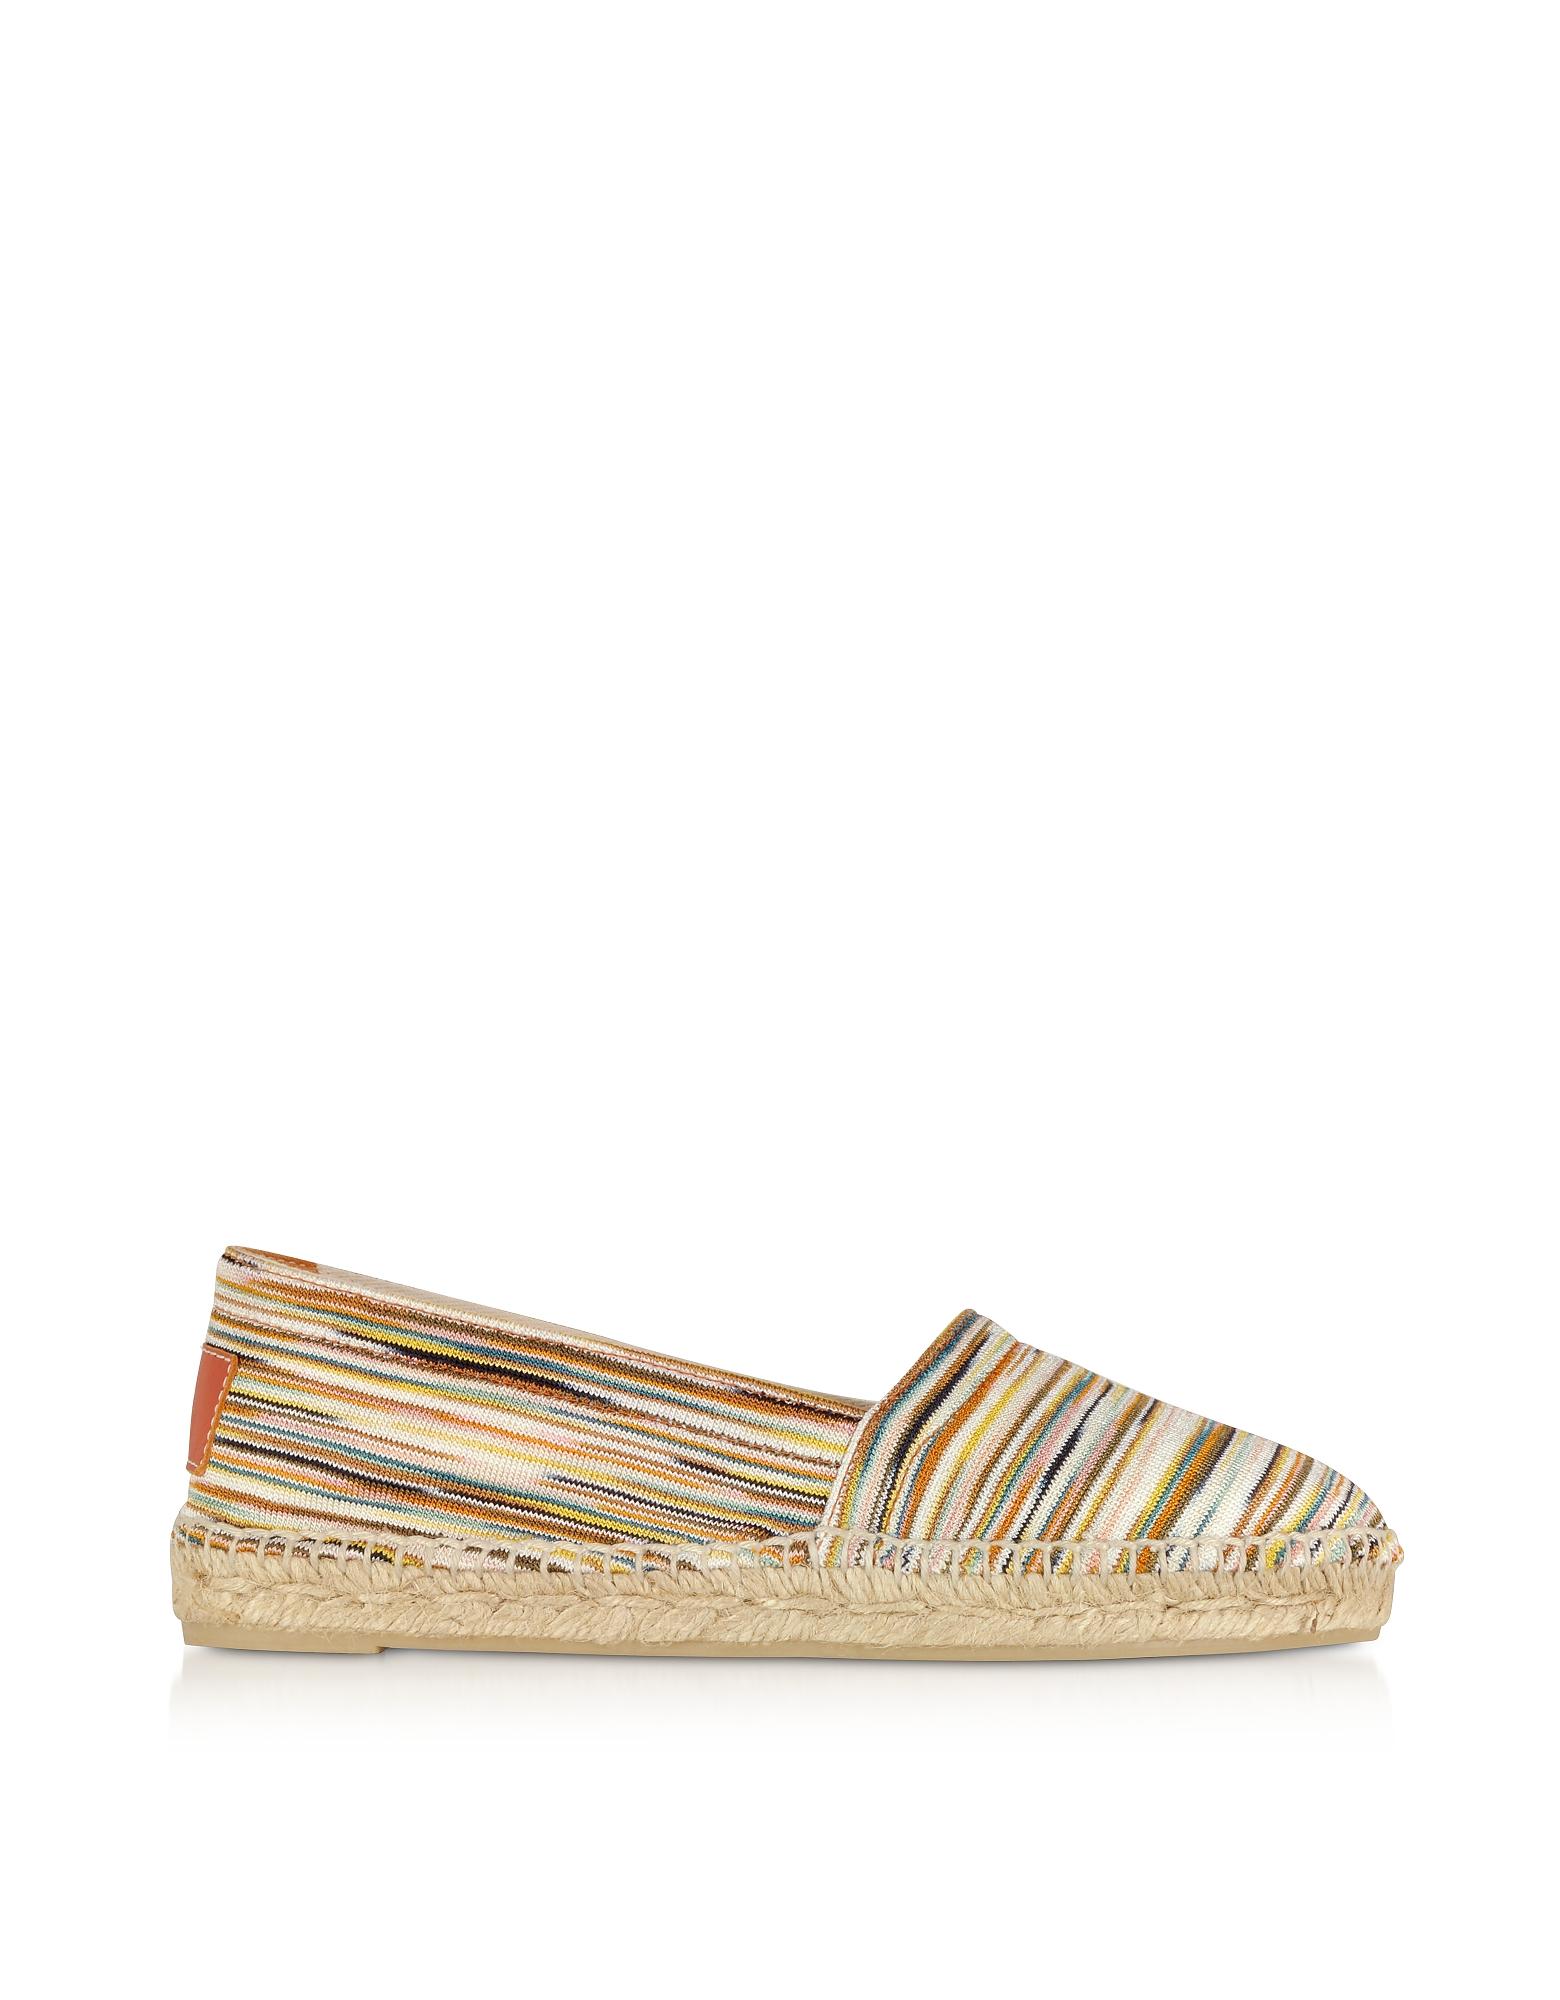 Missoni Designer Shoes, X Castañer - Kenda Multicolor Canvas Espadrilles